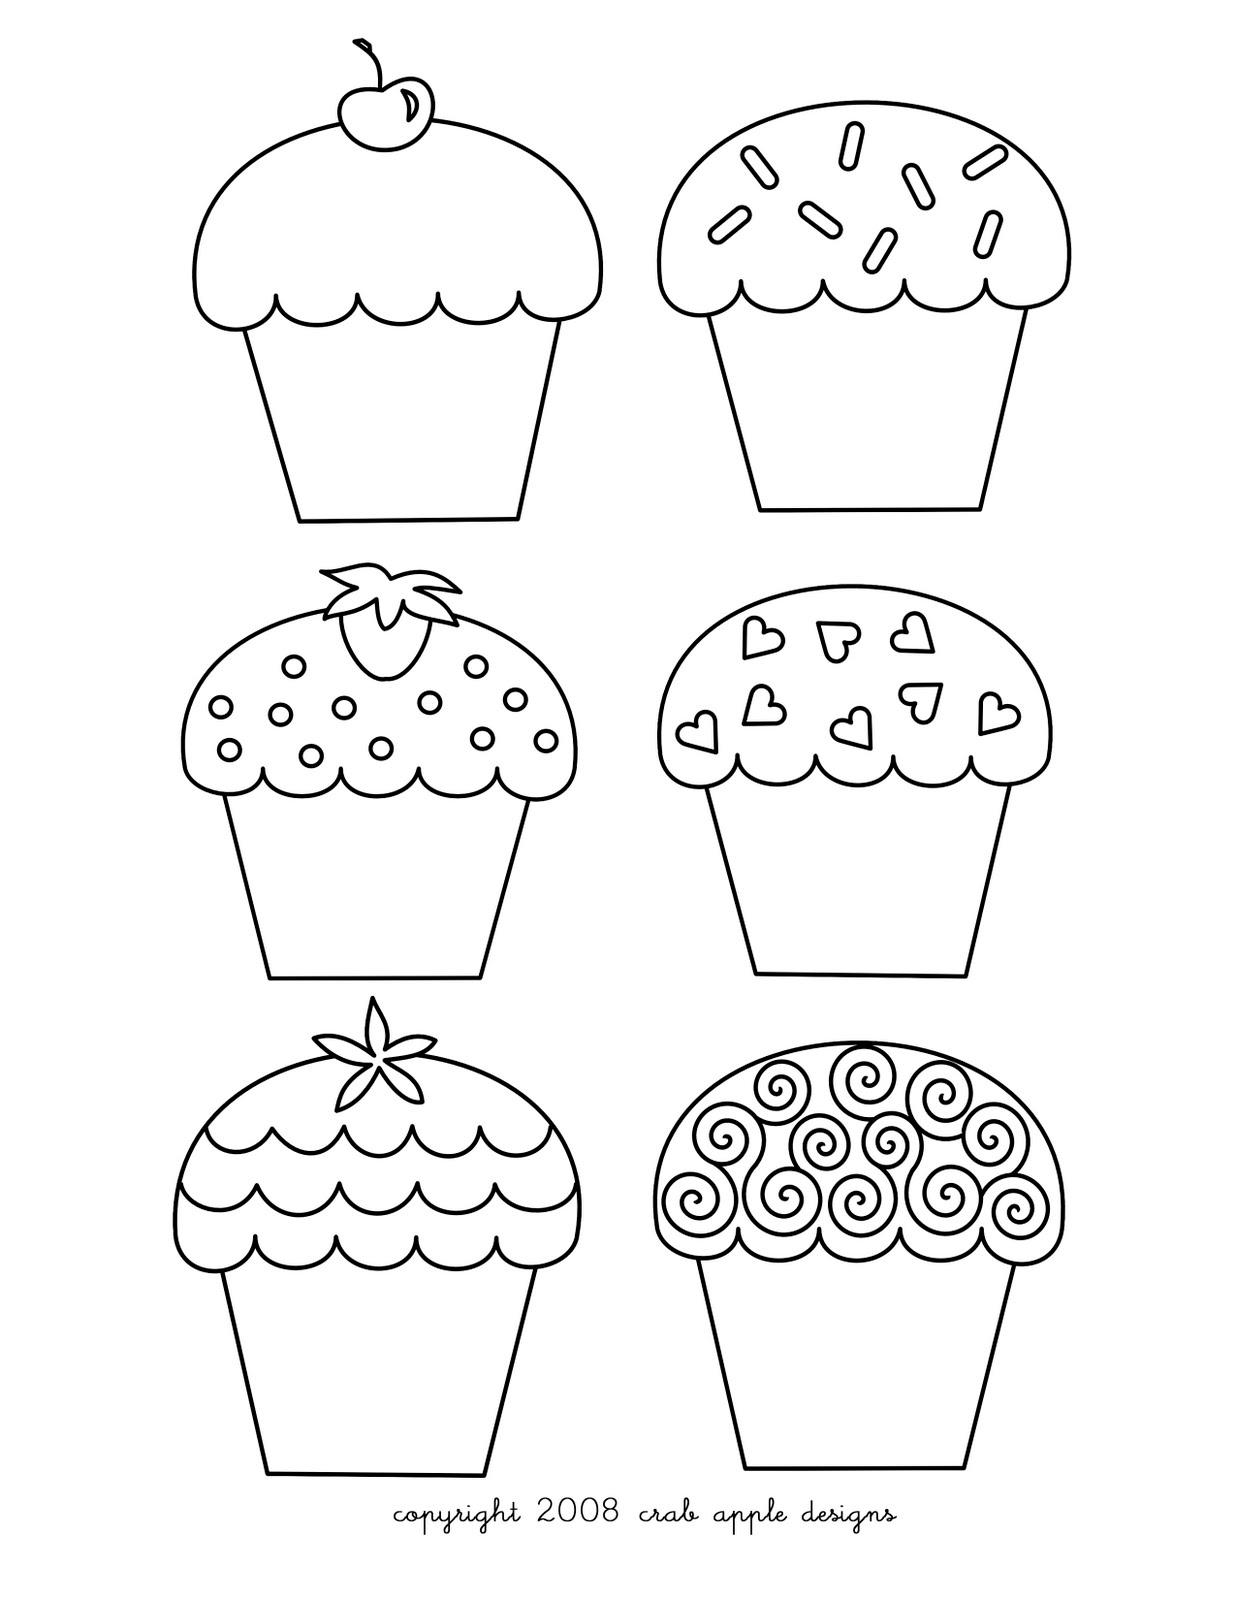 Art'sanália : Riscos para pintar cupcakes!